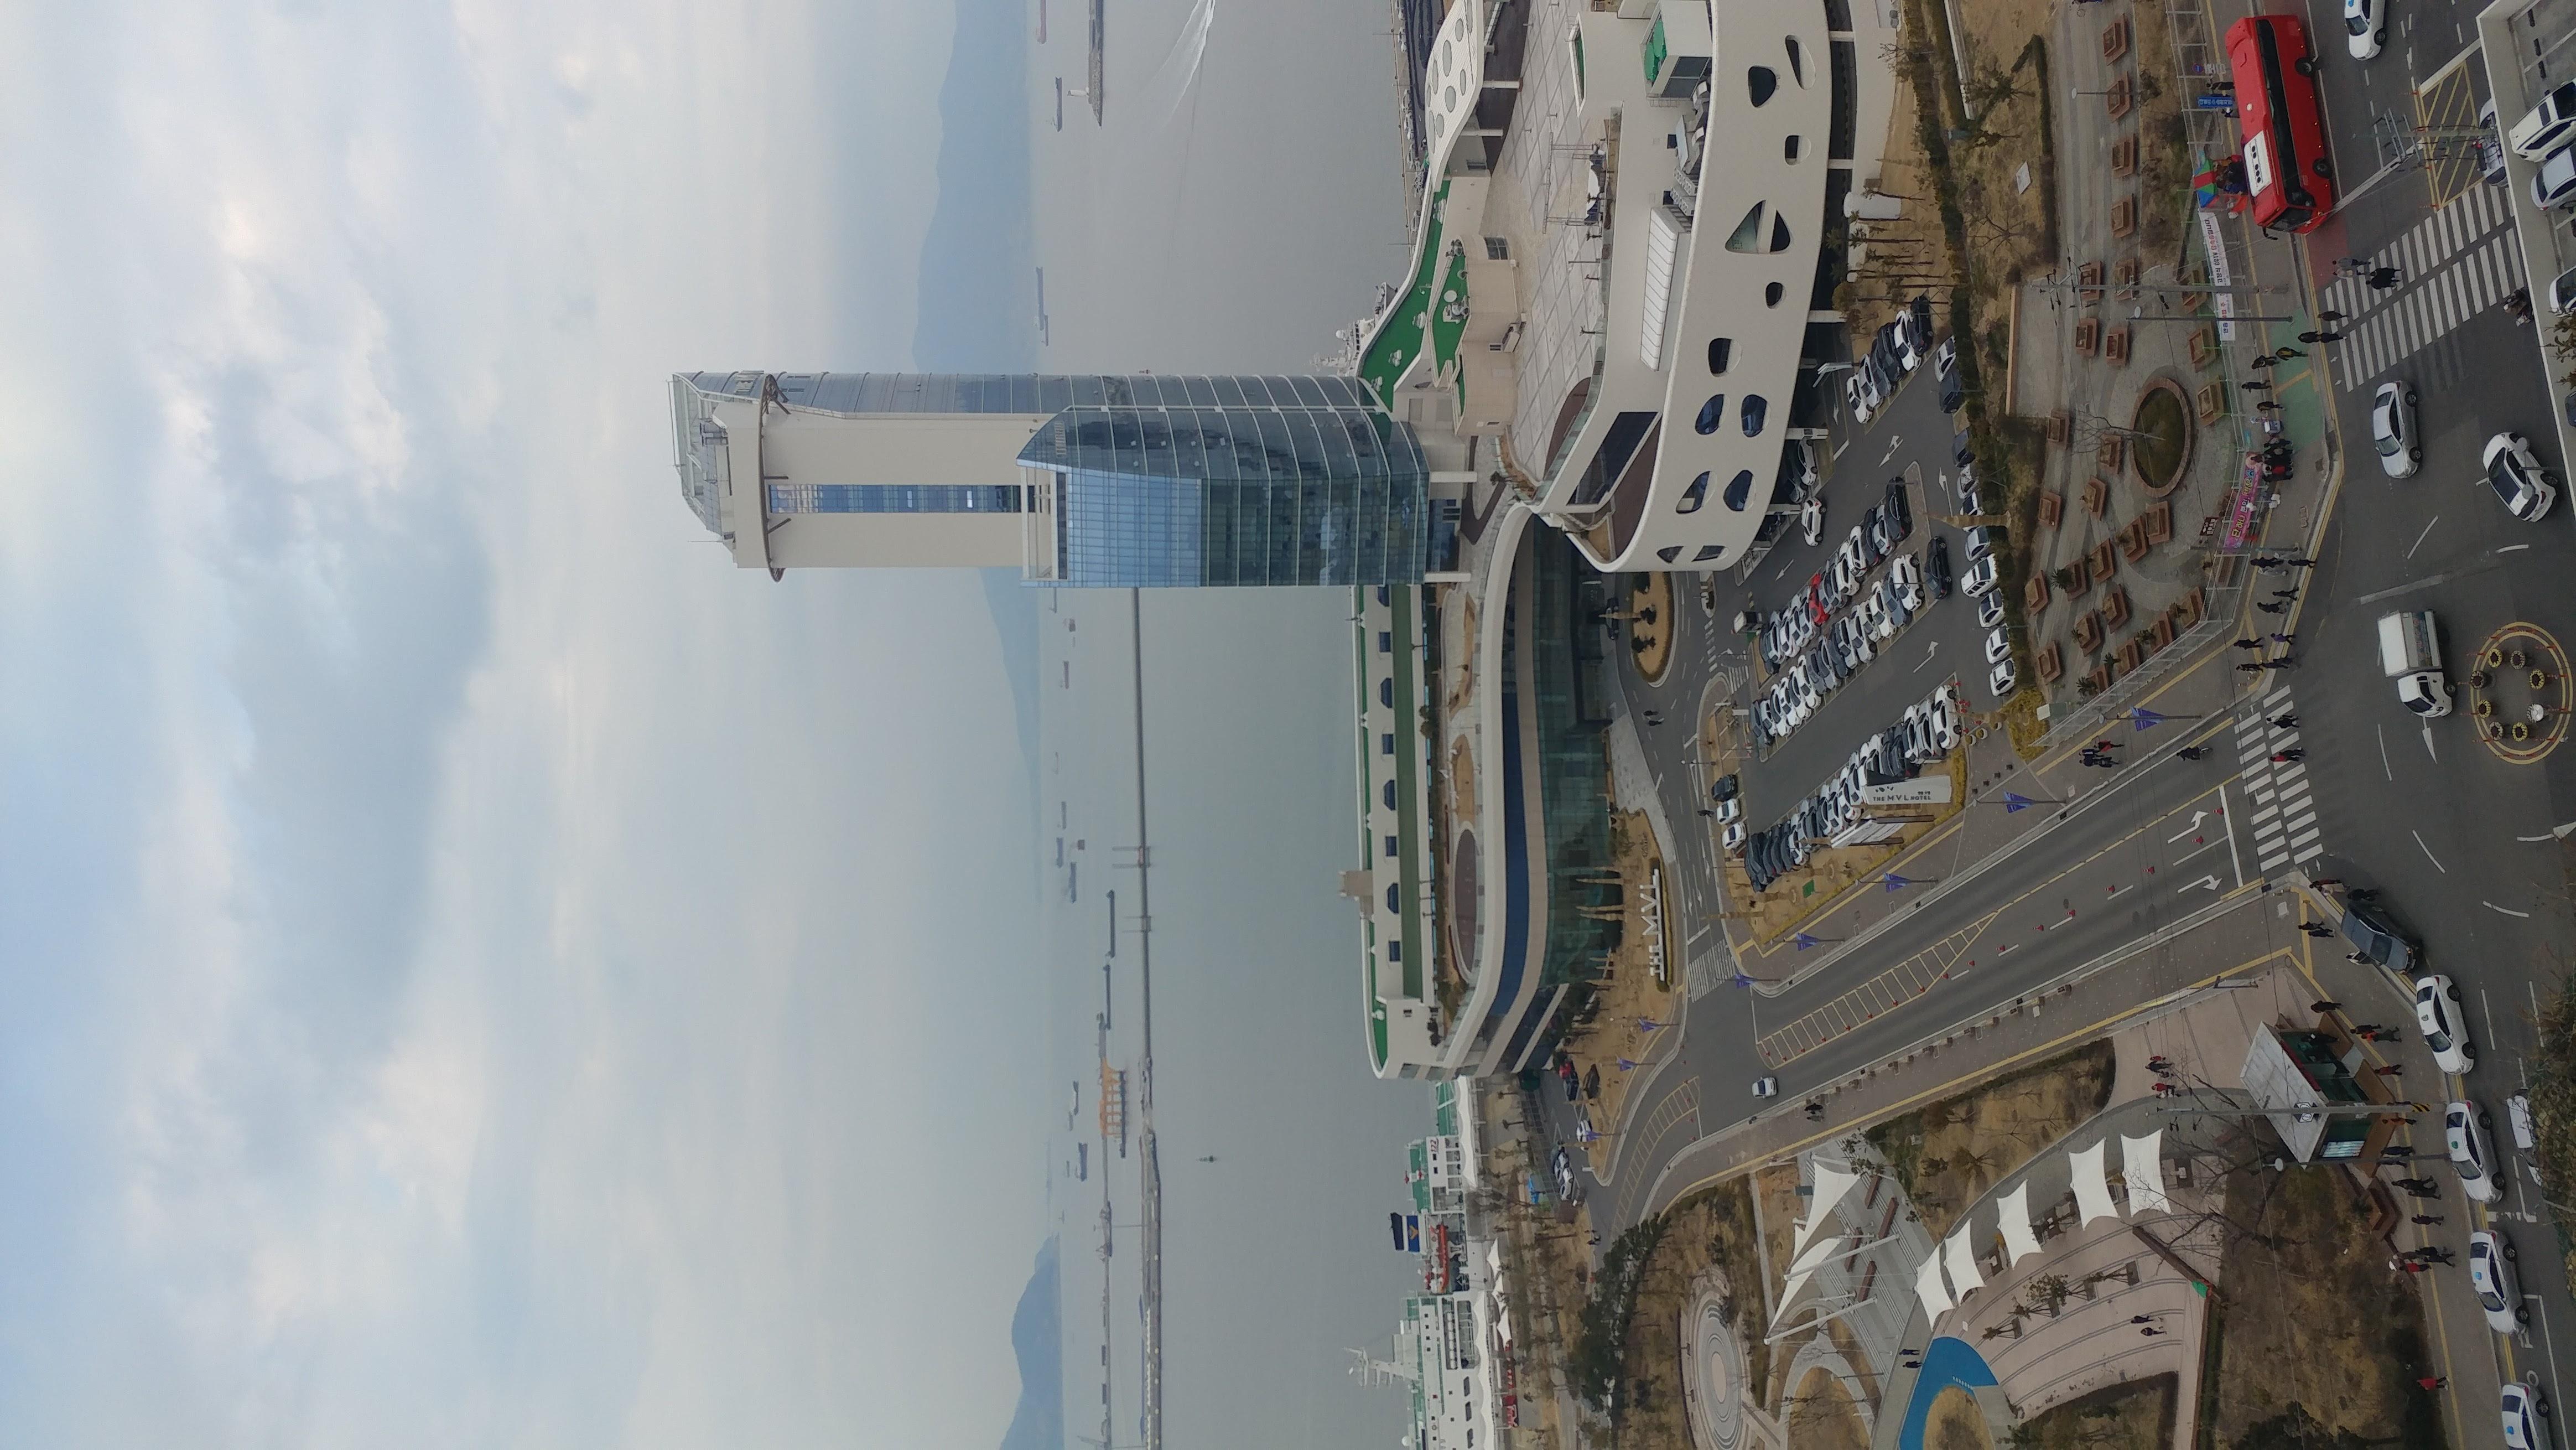 File:Yeosu MVL Hotel.jpg - Wikimedia Commons